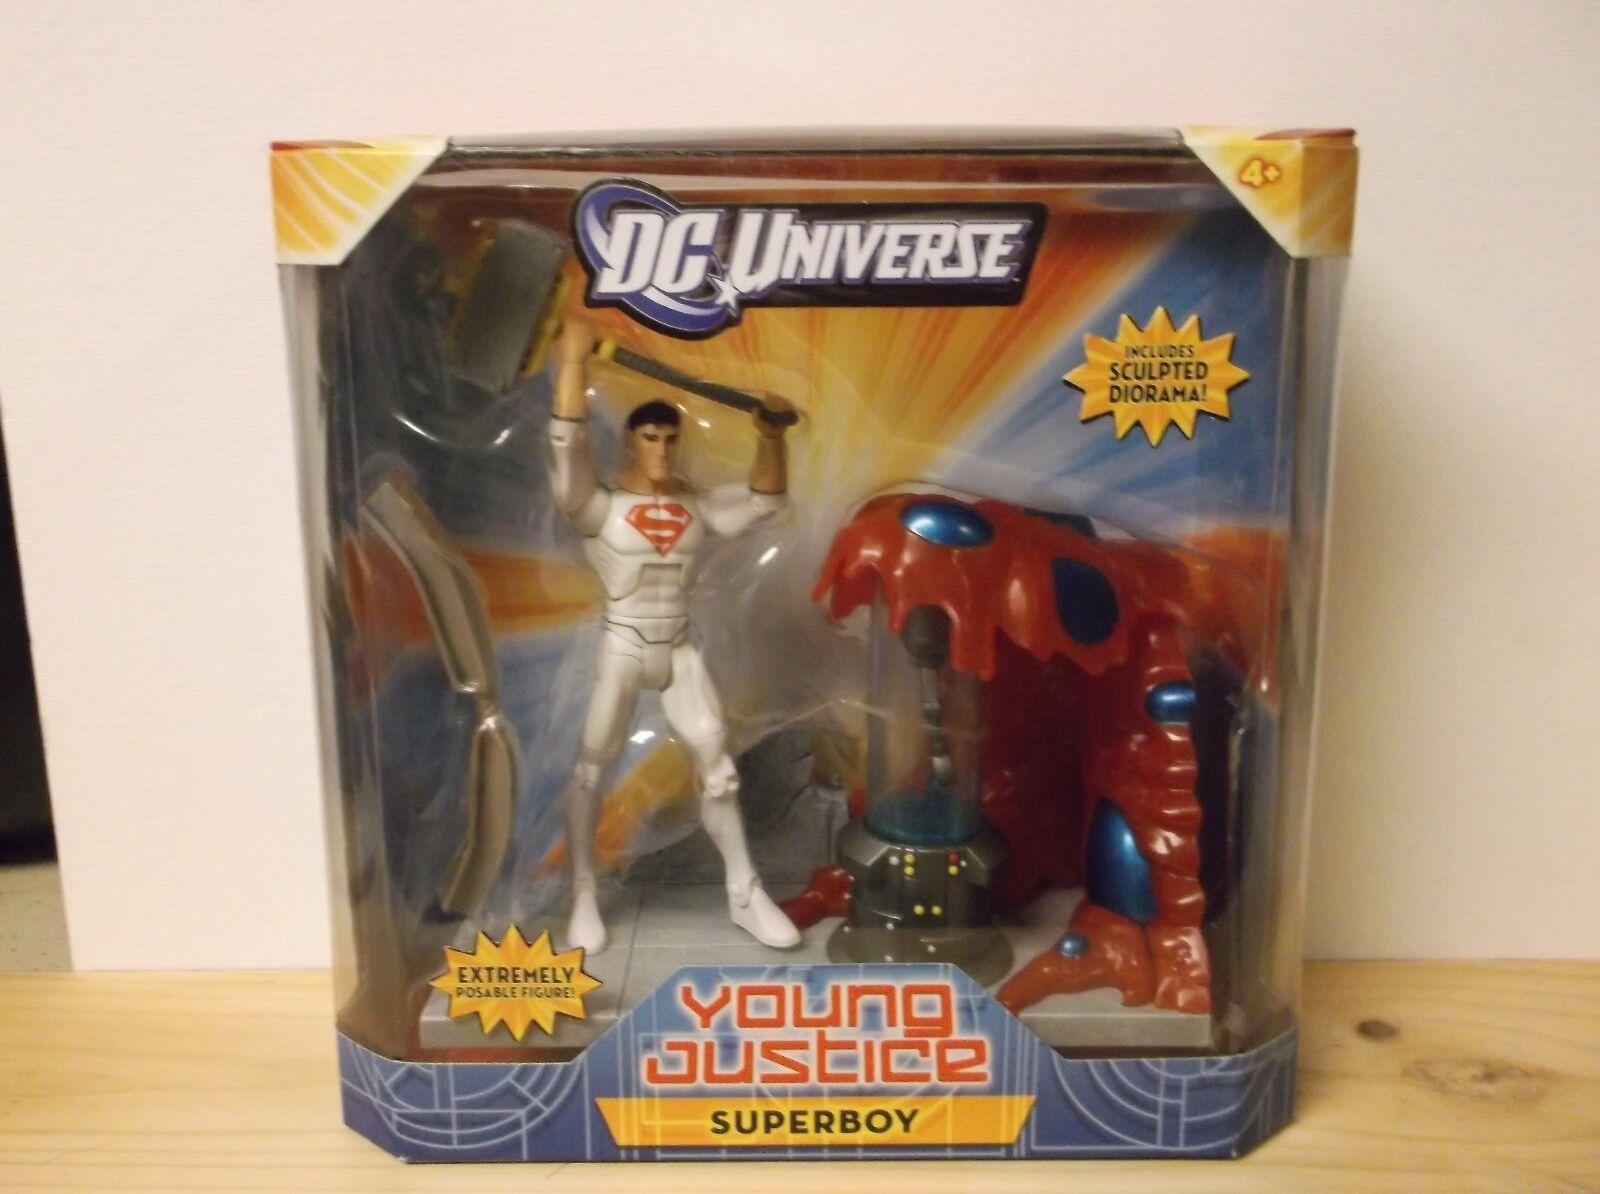 Dc - universum jung justiz superboy abbildung